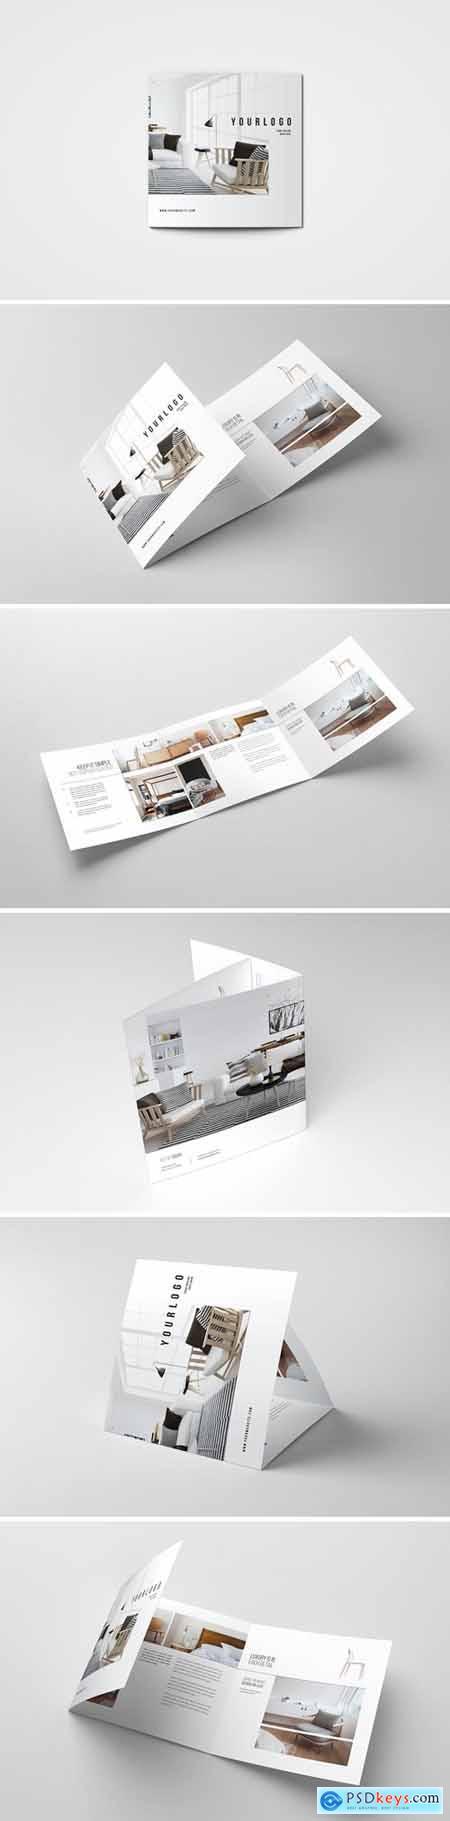 Square Minimal Interior Design Trifold